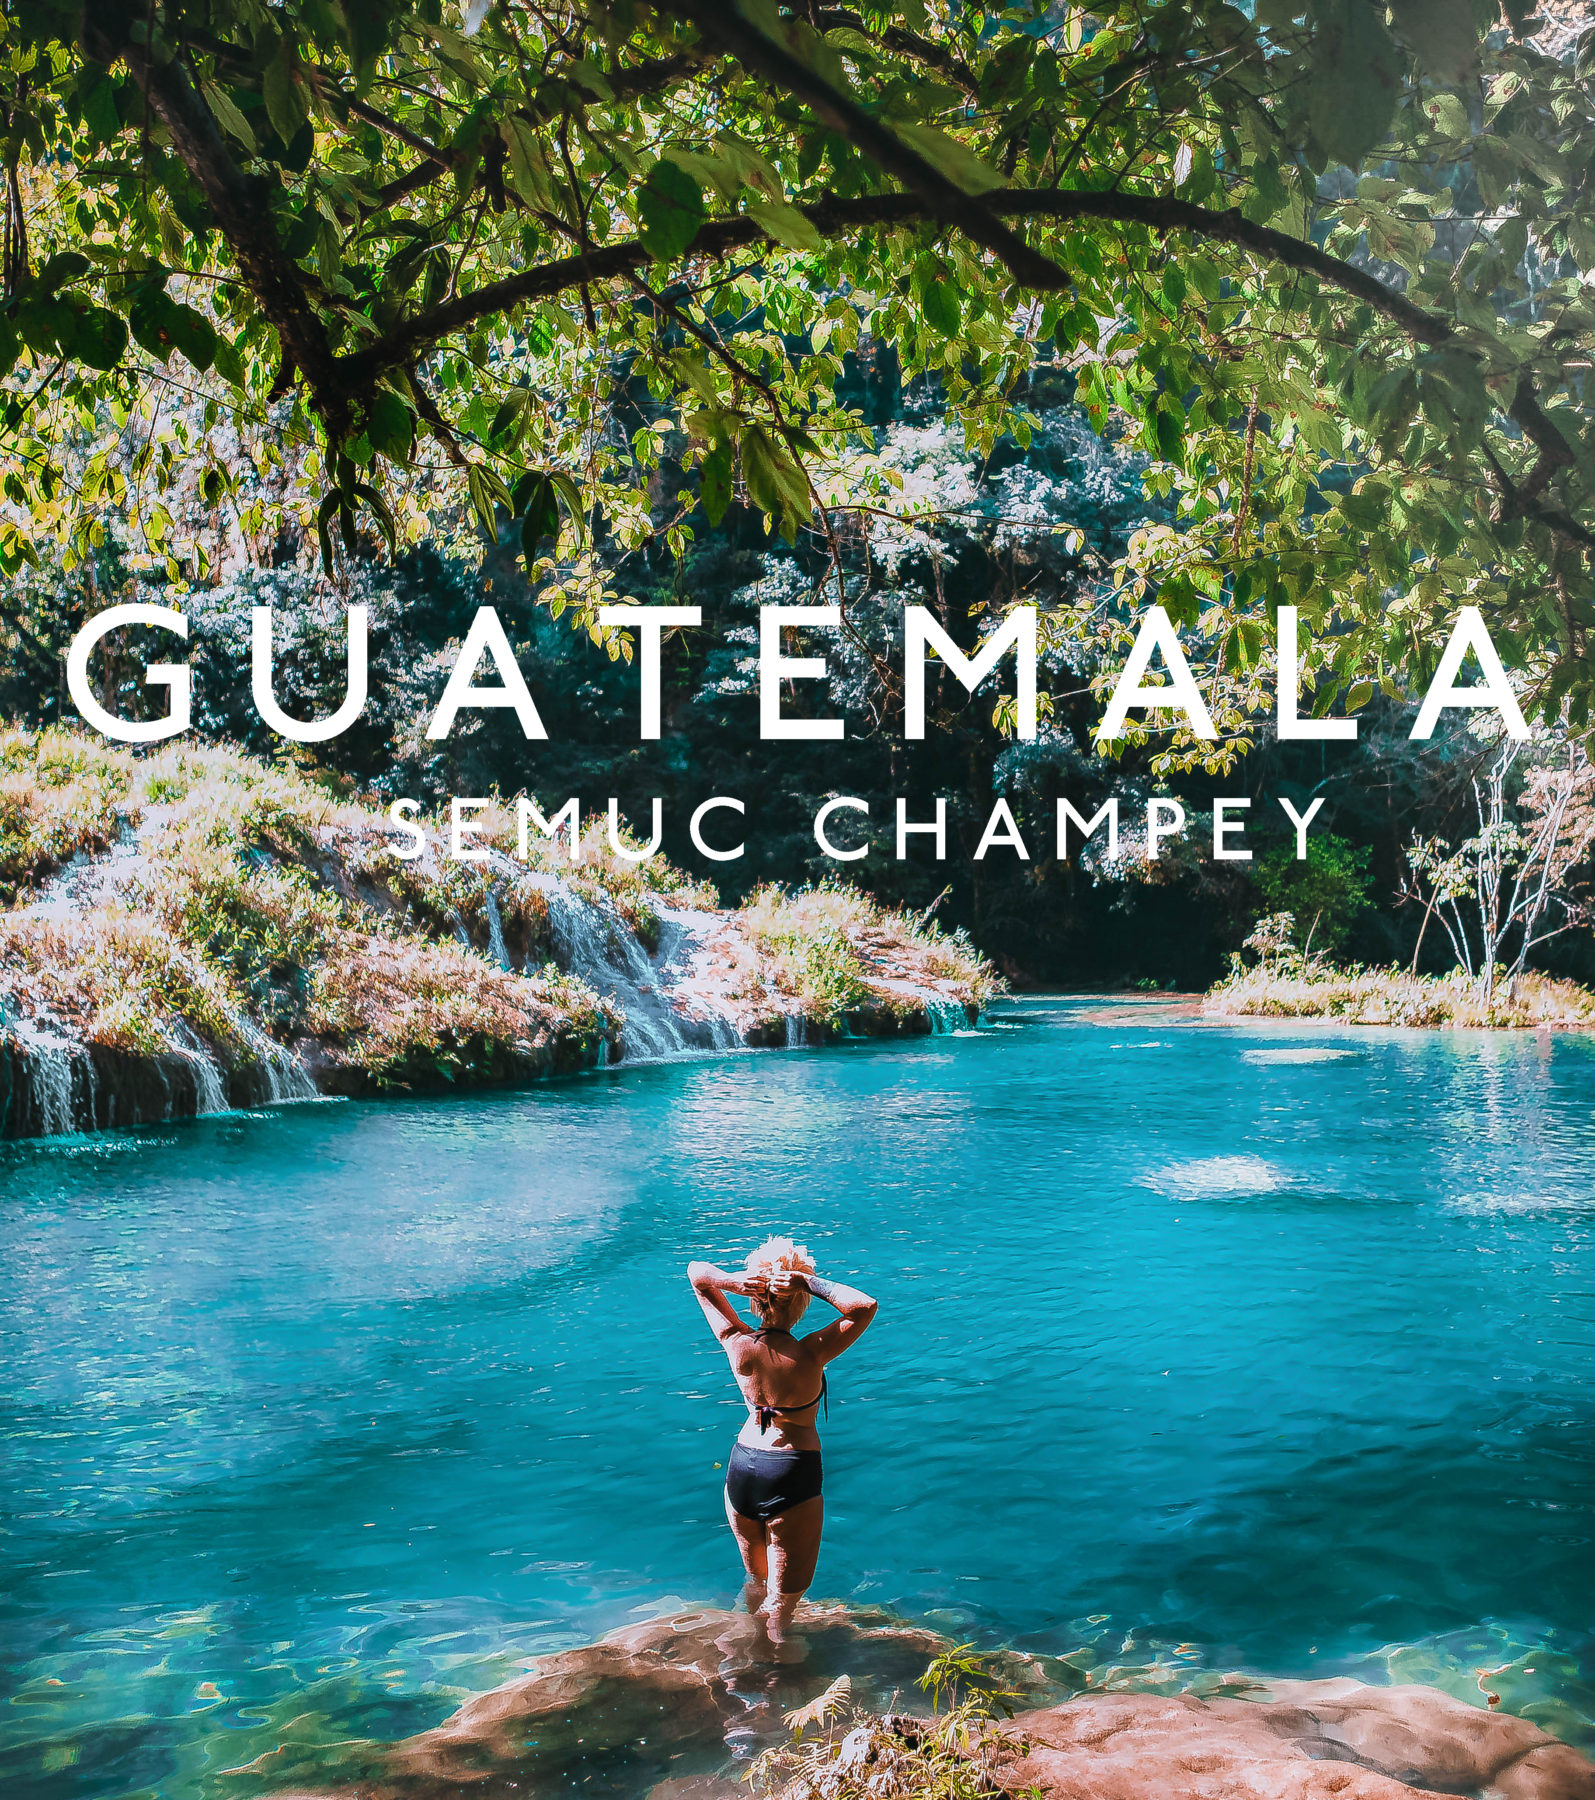 guatemala semuc champey turquoise pools jungle green humid swim adventure far away hidden paradise